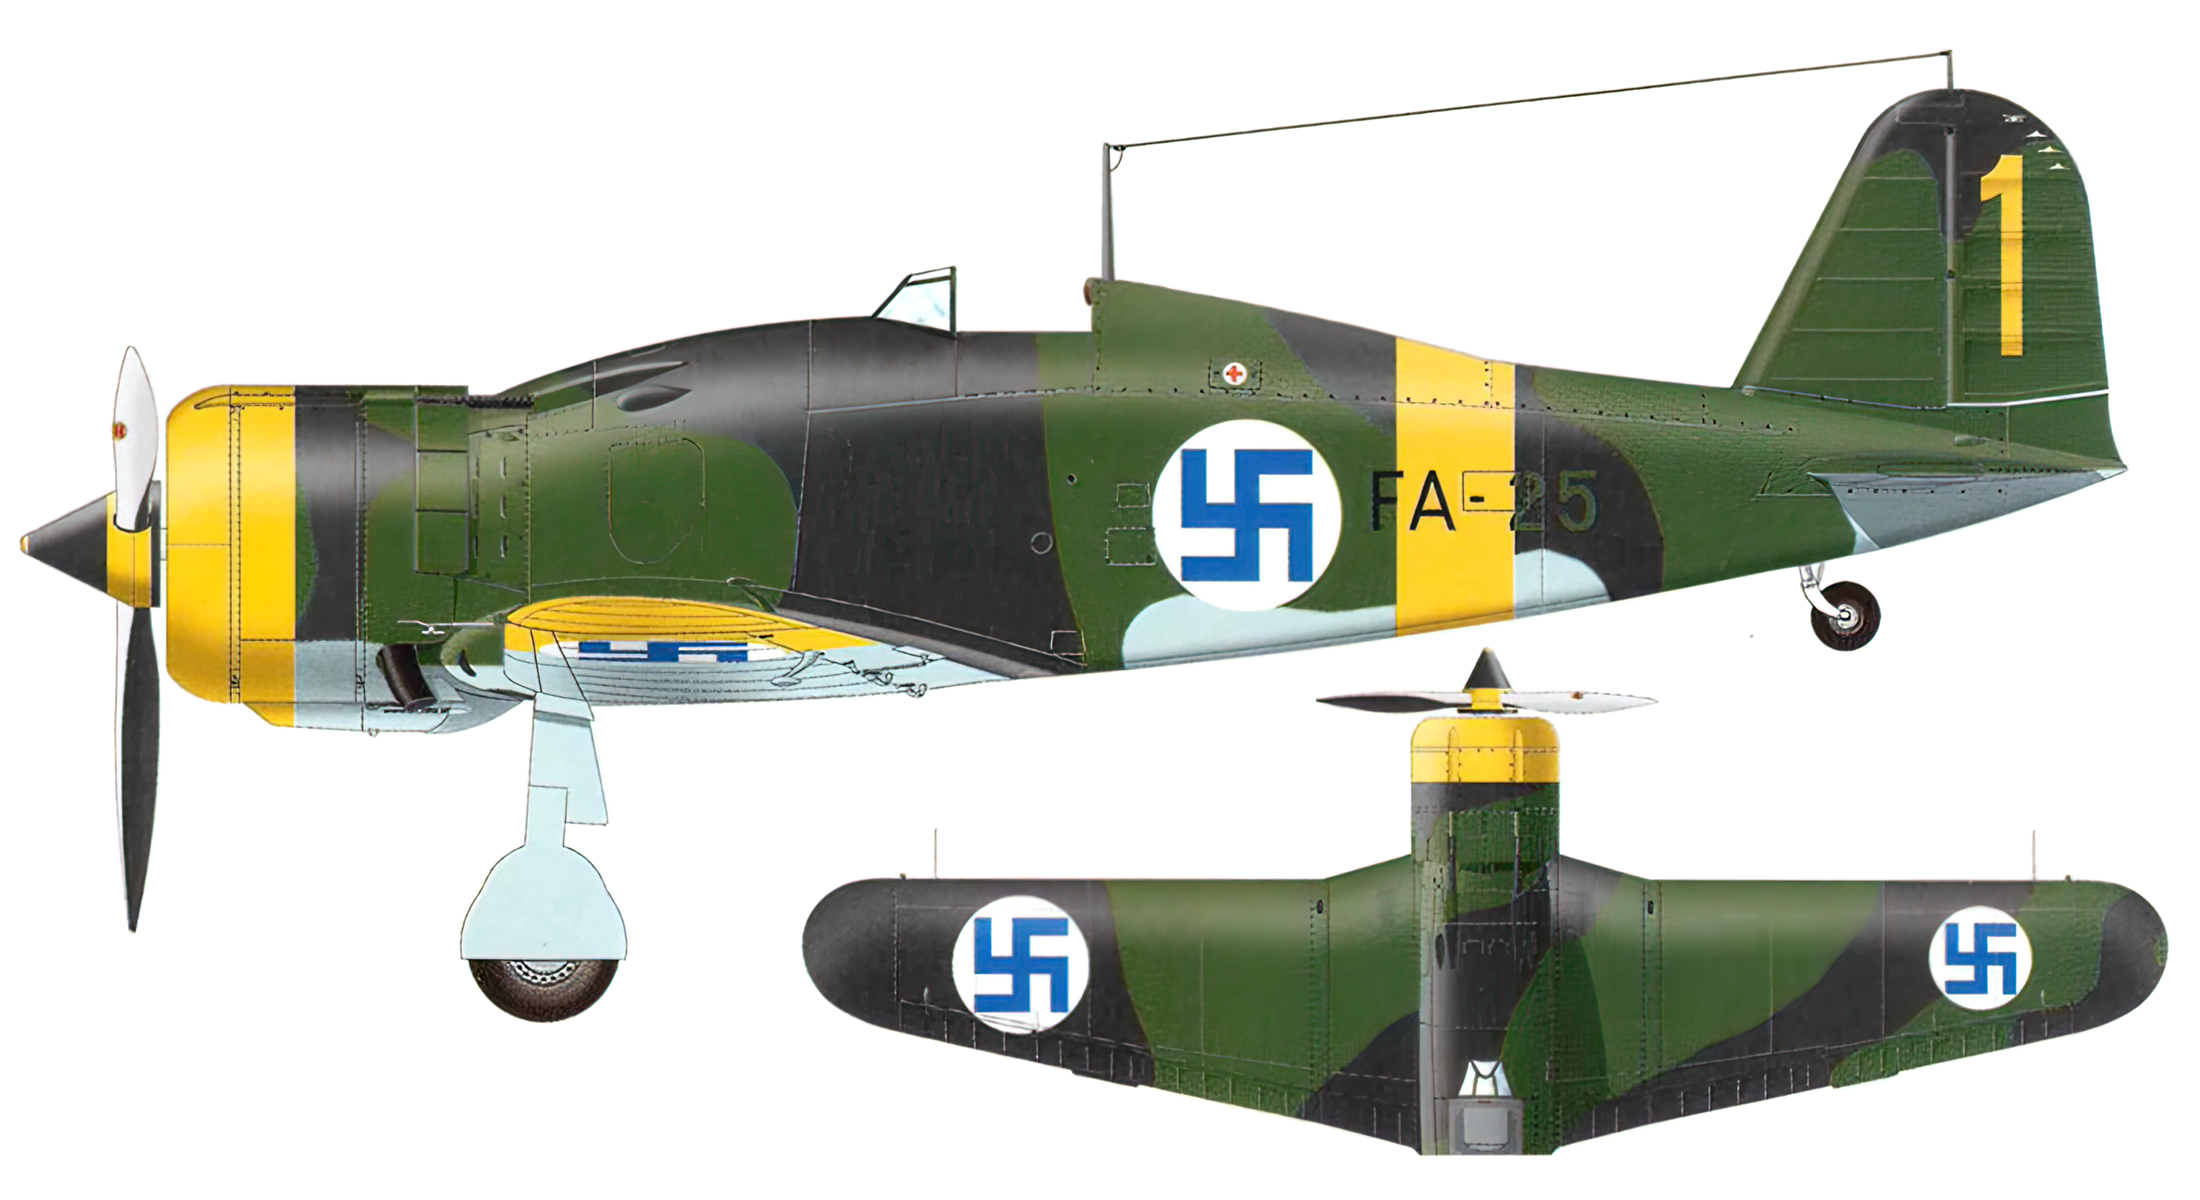 Fiat G50 Freccia FAF 3.LeLv26 FA25 MM3614 Olli Puhakka Kilpasilta Oct 1942 0A